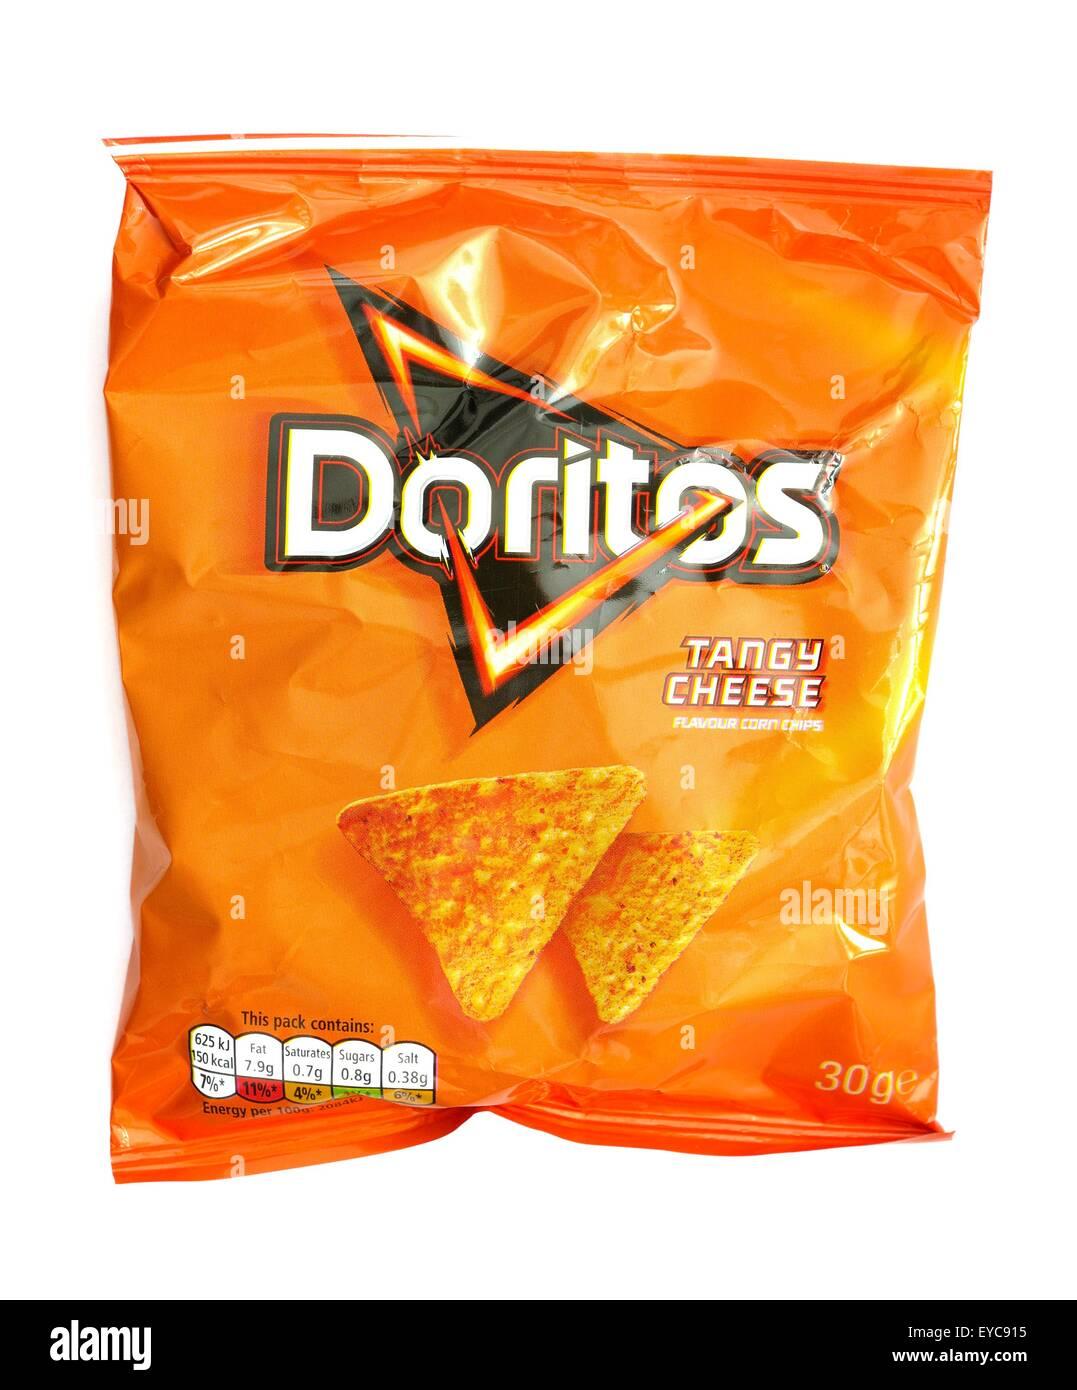 A bag of tangy cheese doritos - Stock Image